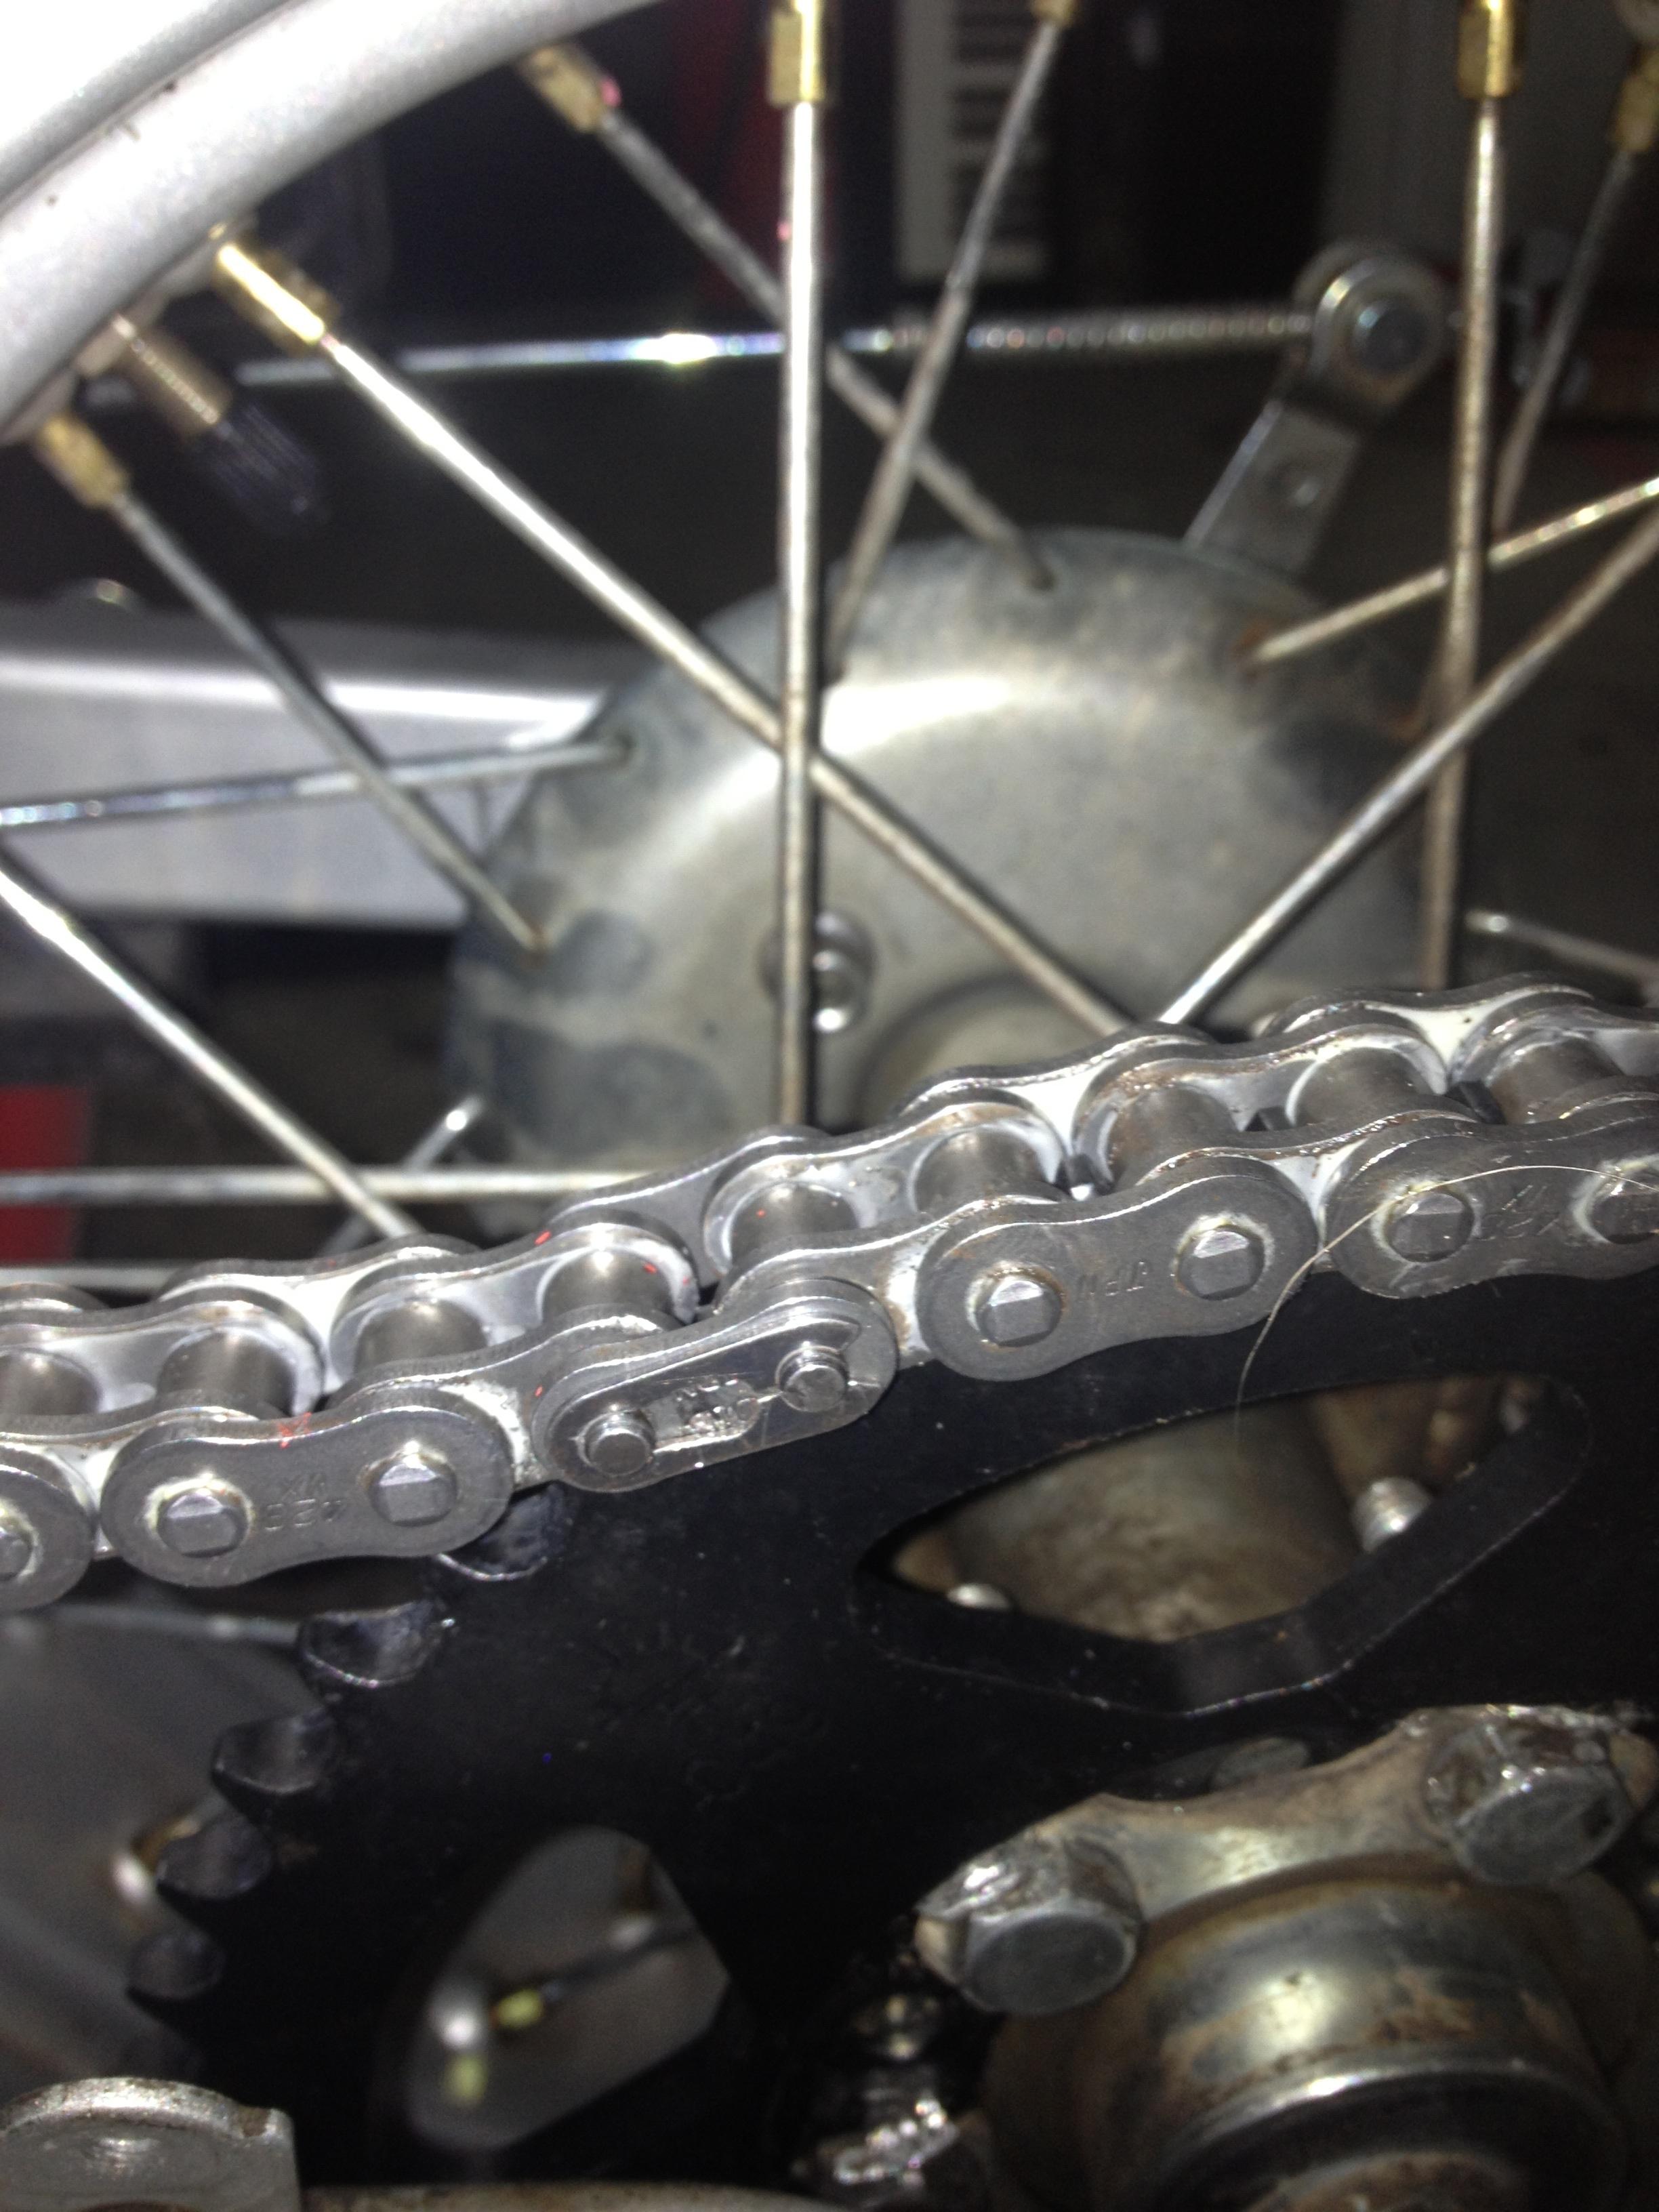 Oil13 - Yamaha Tw 125 Chain Detail 2